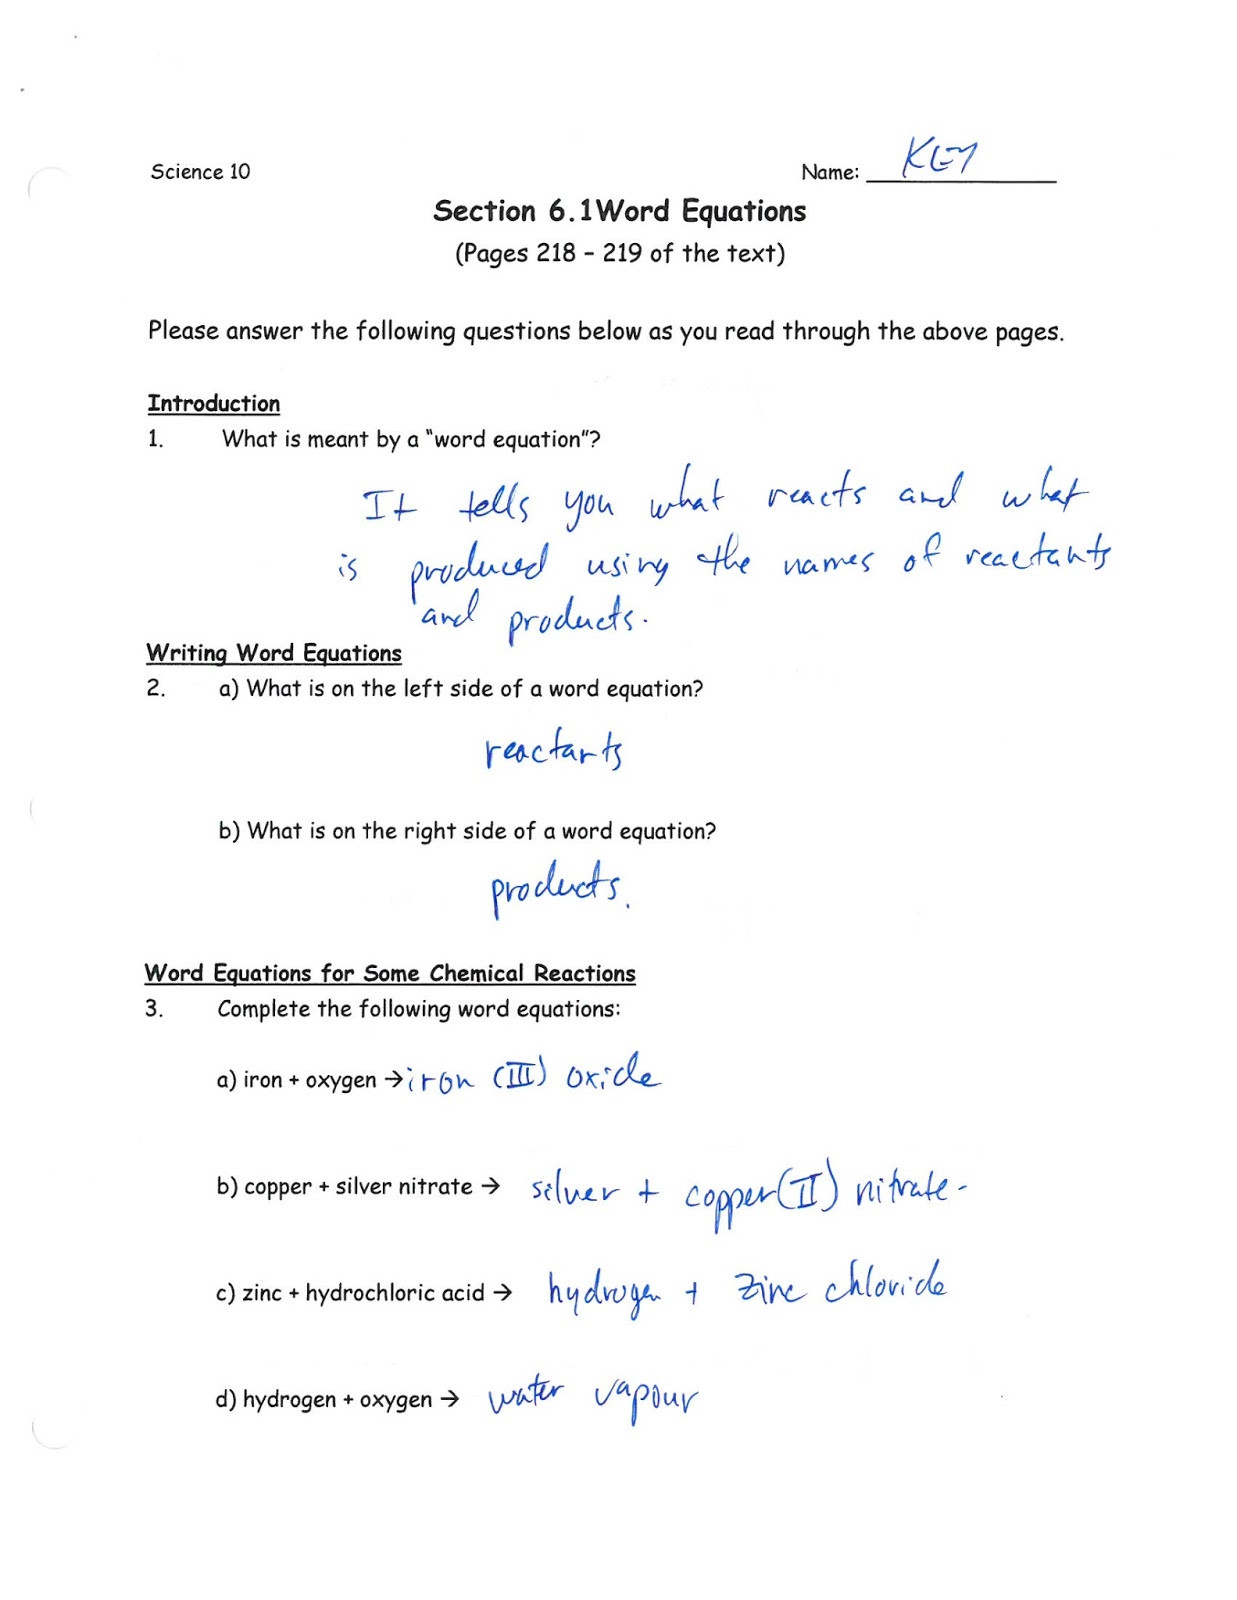 Balancing Nuclear Equations Worksheet Answers Balancing Equations Worksheet for Grade 7 with Answers